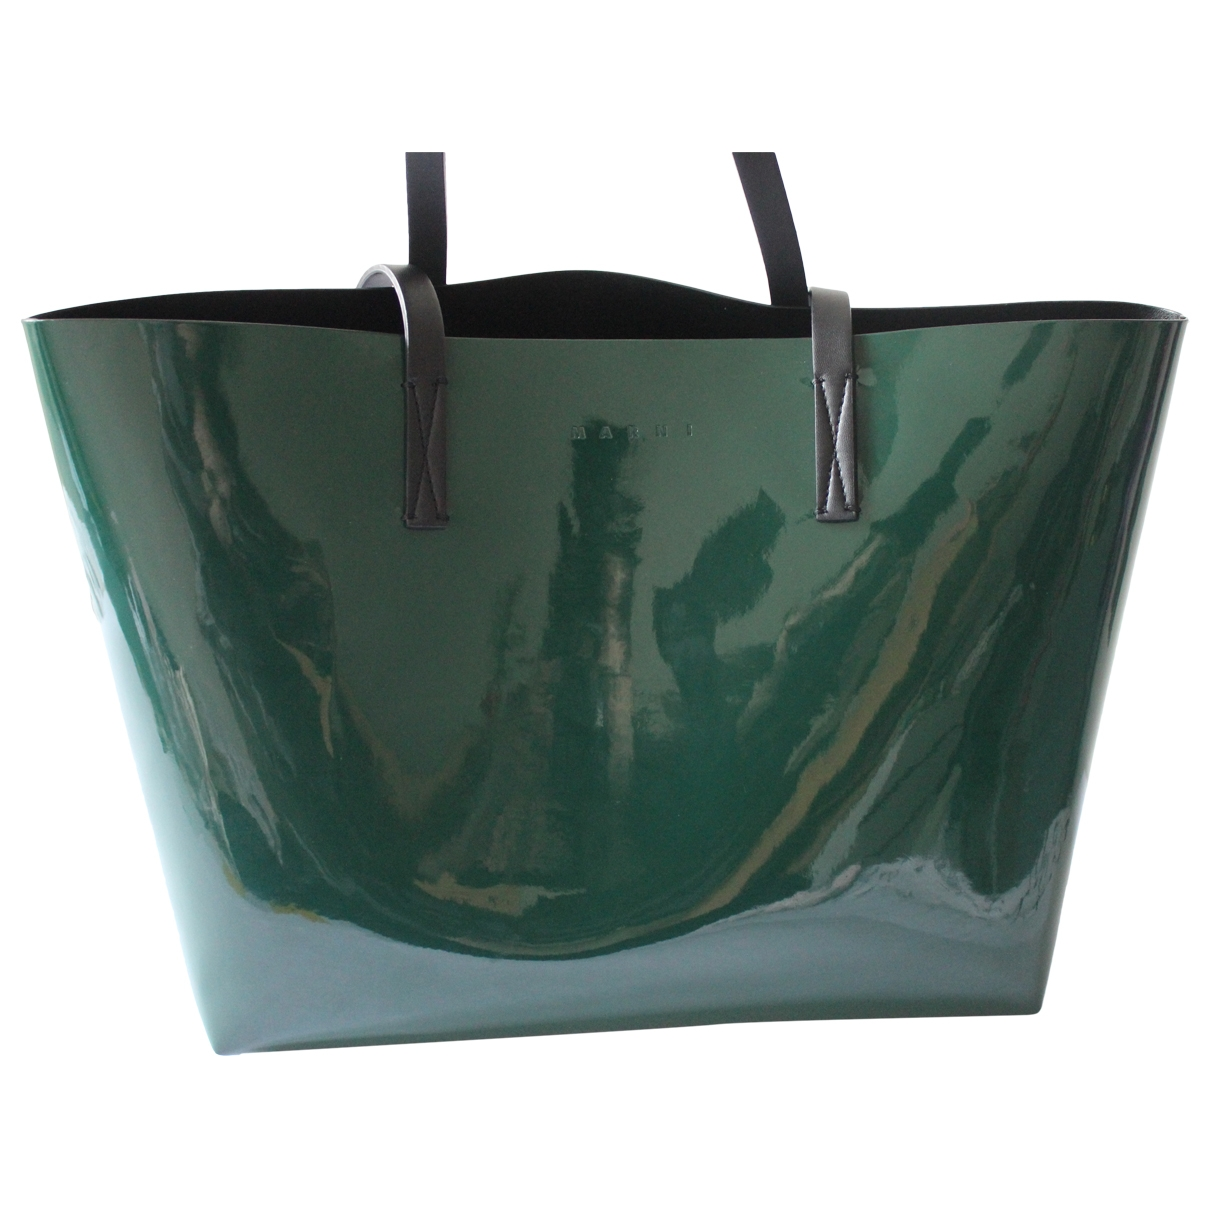 Marni \N Green Patent leather handbag for Women \N